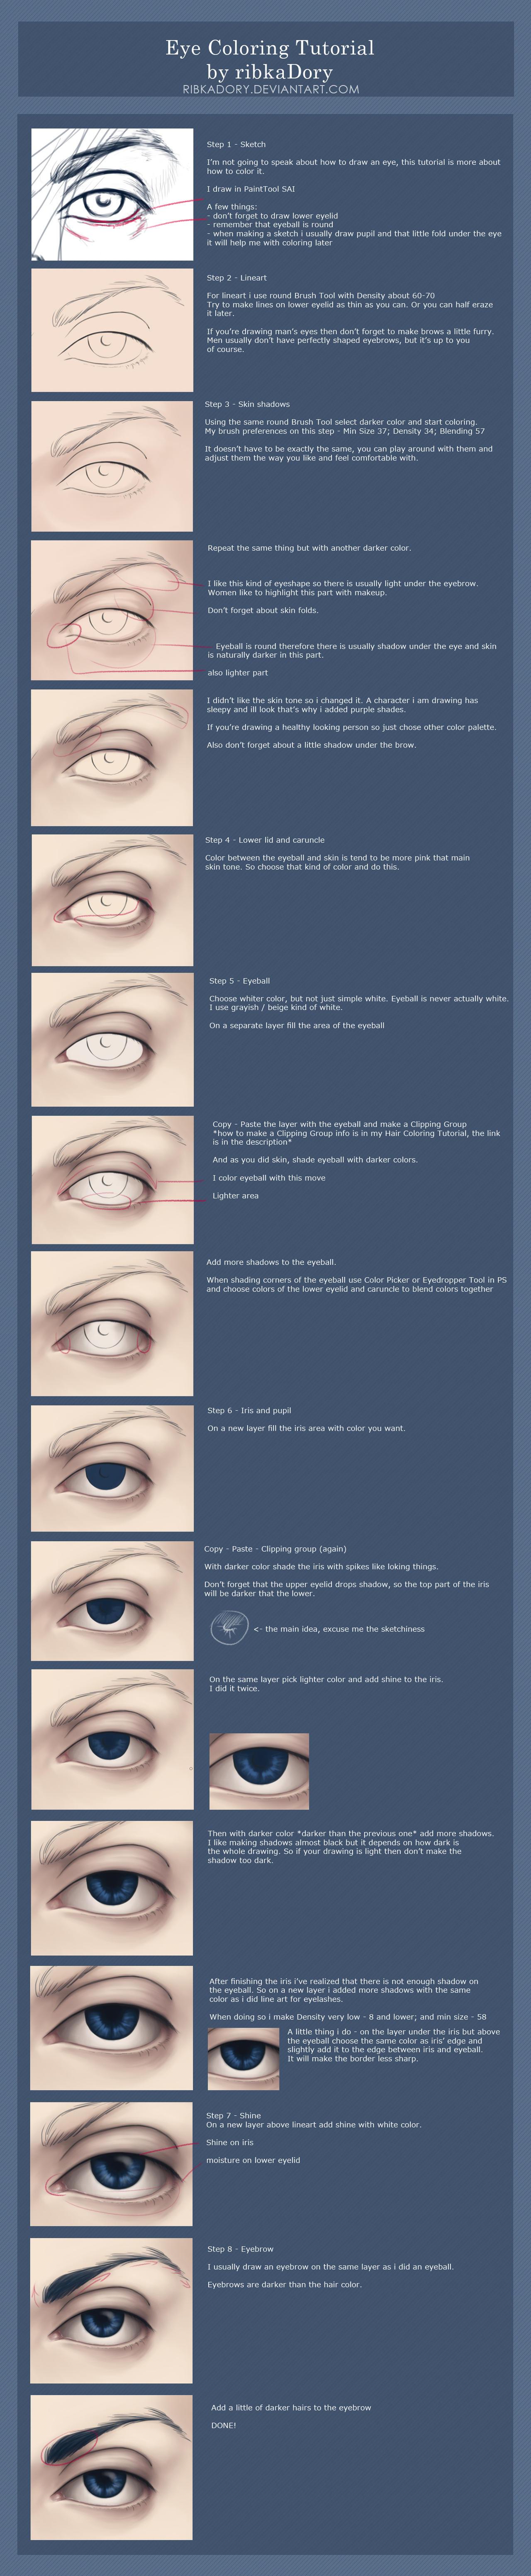 Eye Coloring Tutorial by ribkaDory on DeviantArt